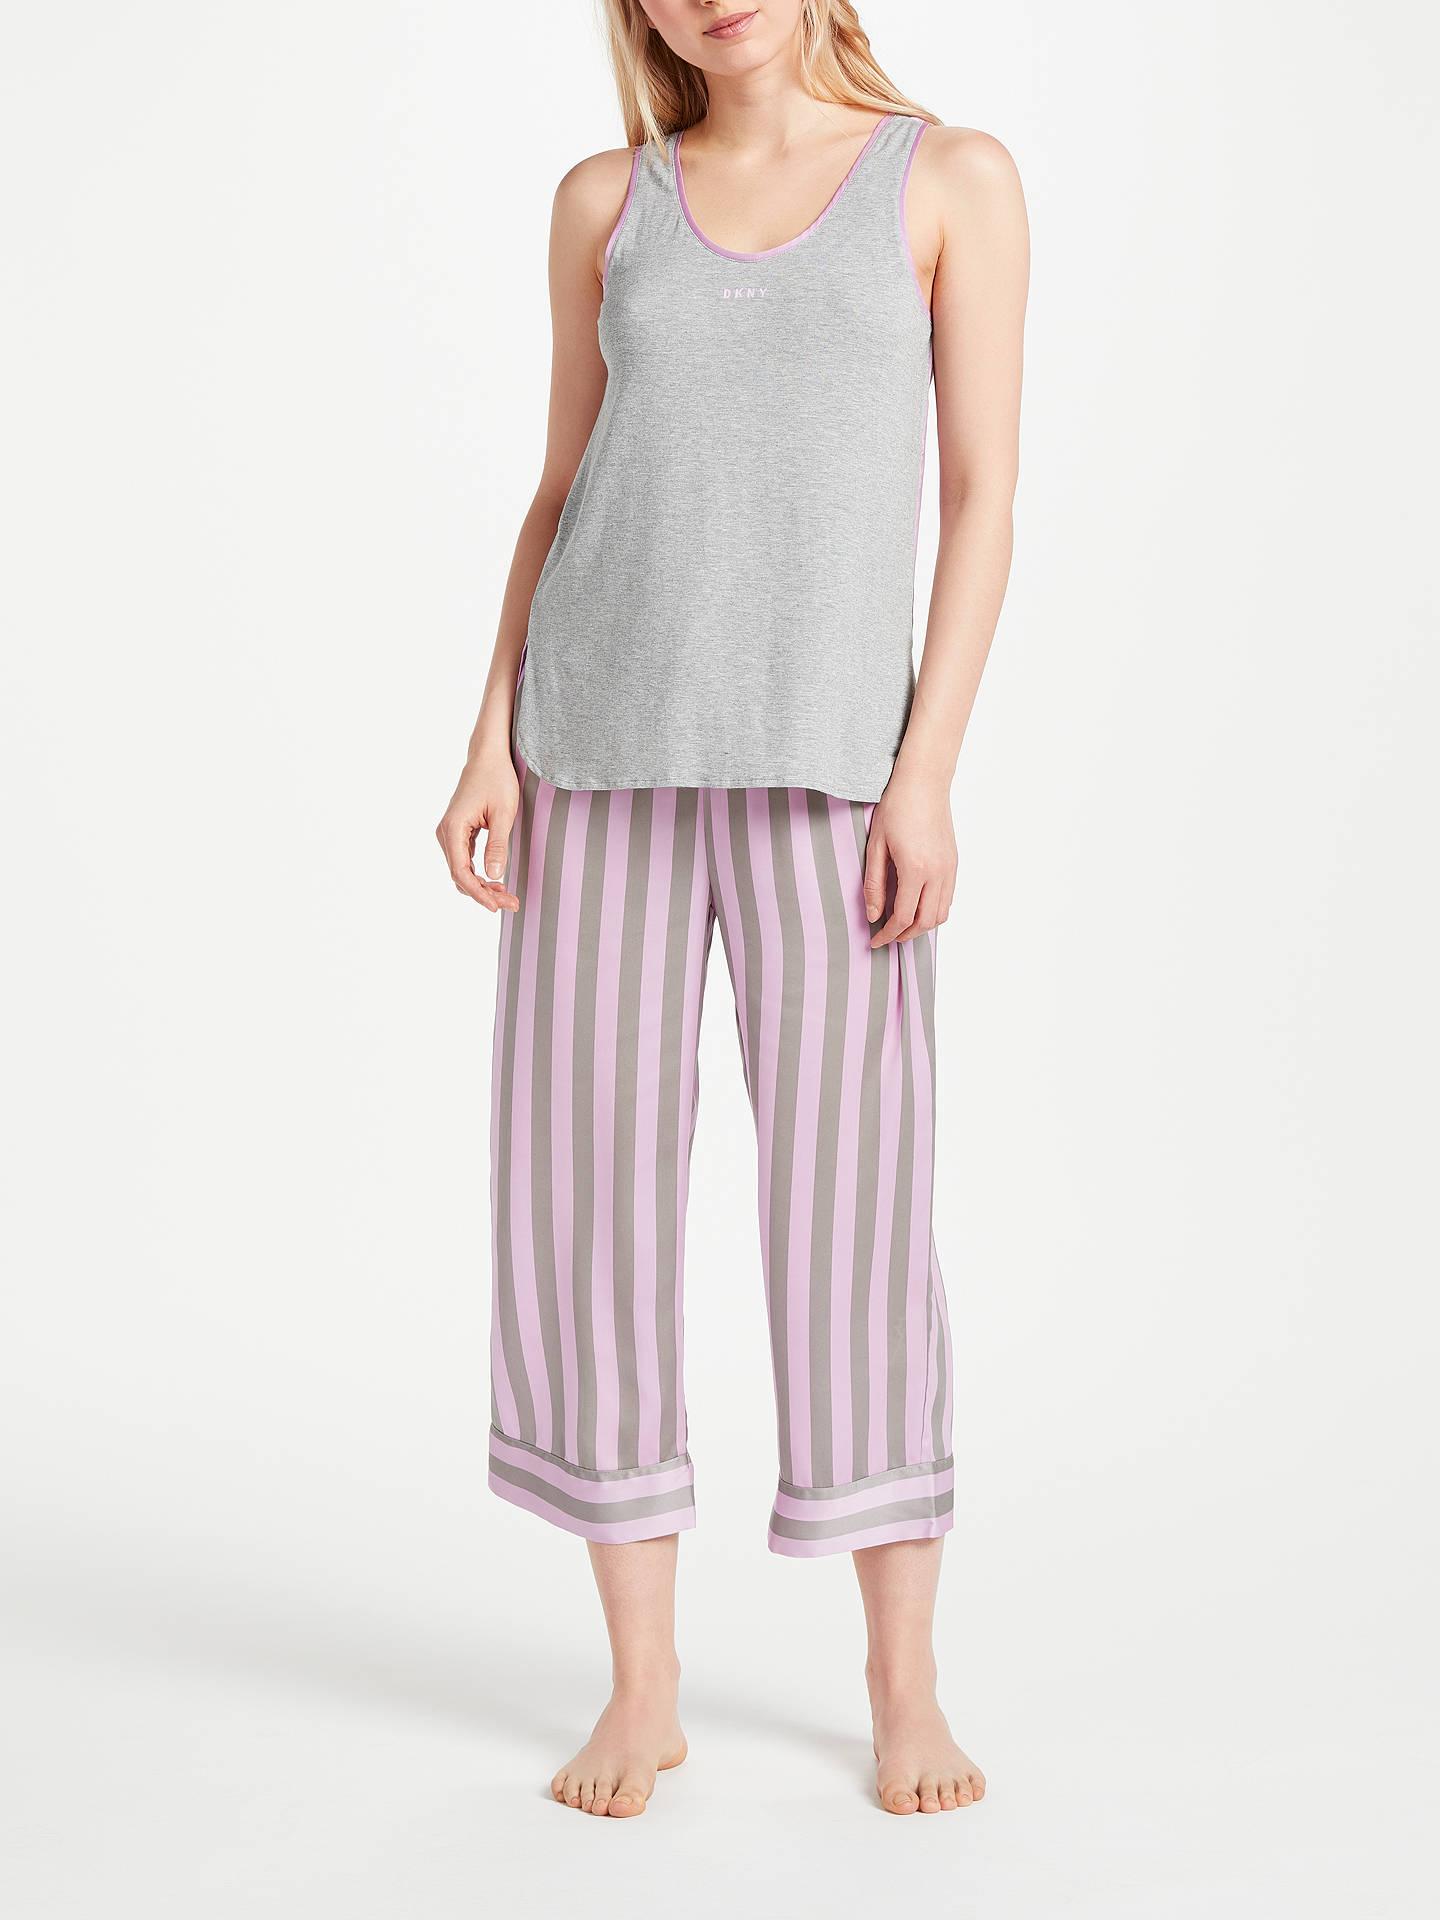 BuyDKNY Walk the Line Tank Top And Crop Trousers Pyjama Set 7d4e82859